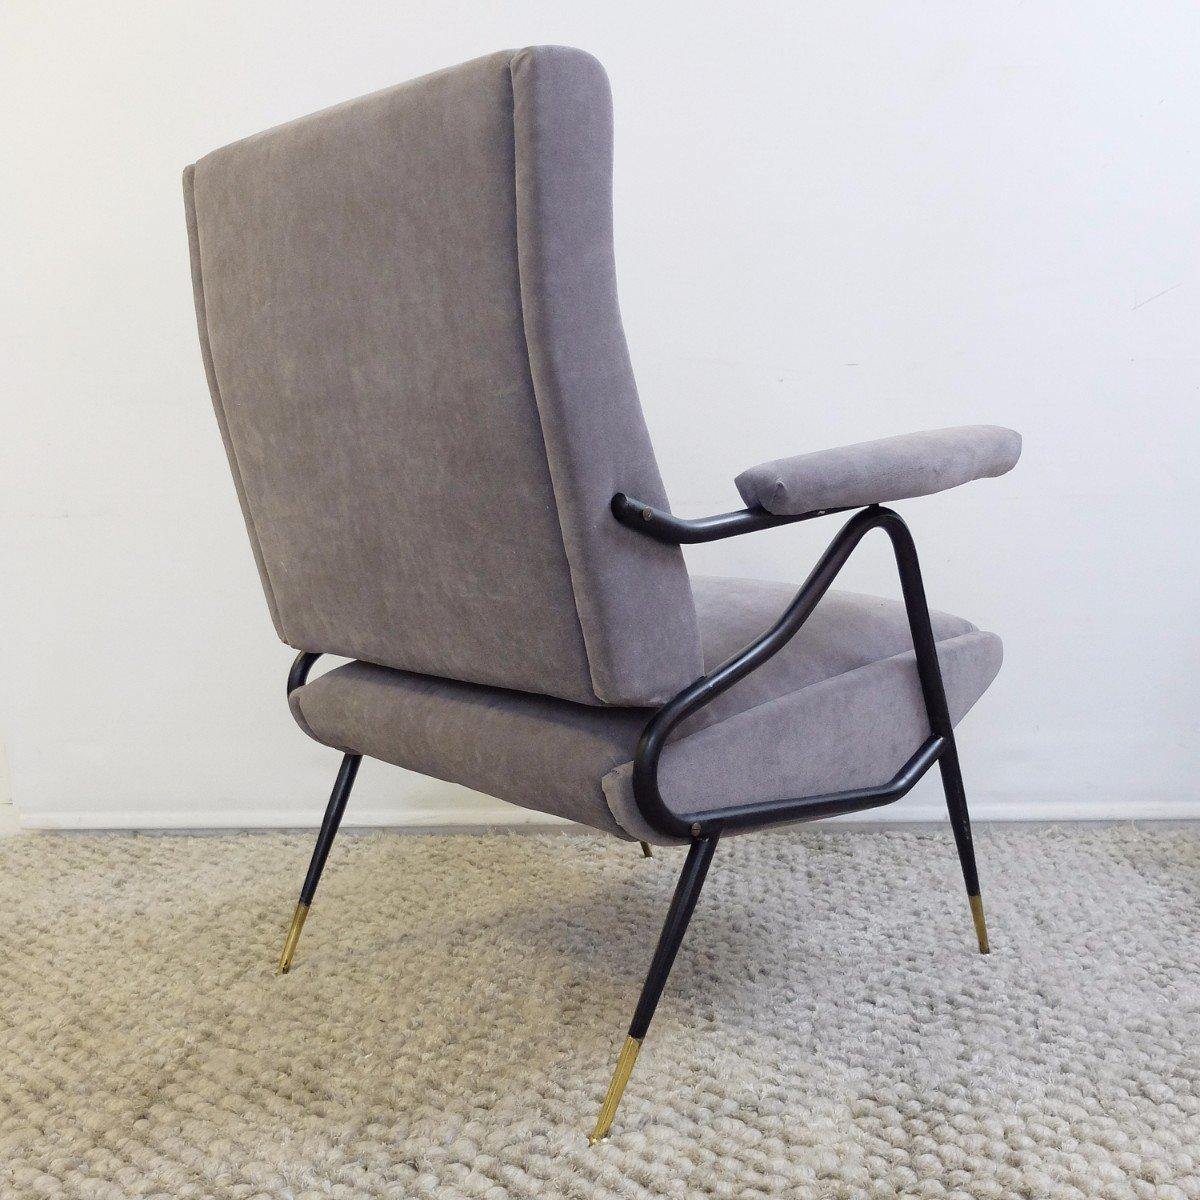 verstellbare italienische vintage sessel 2er set bei pamono kaufen. Black Bedroom Furniture Sets. Home Design Ideas